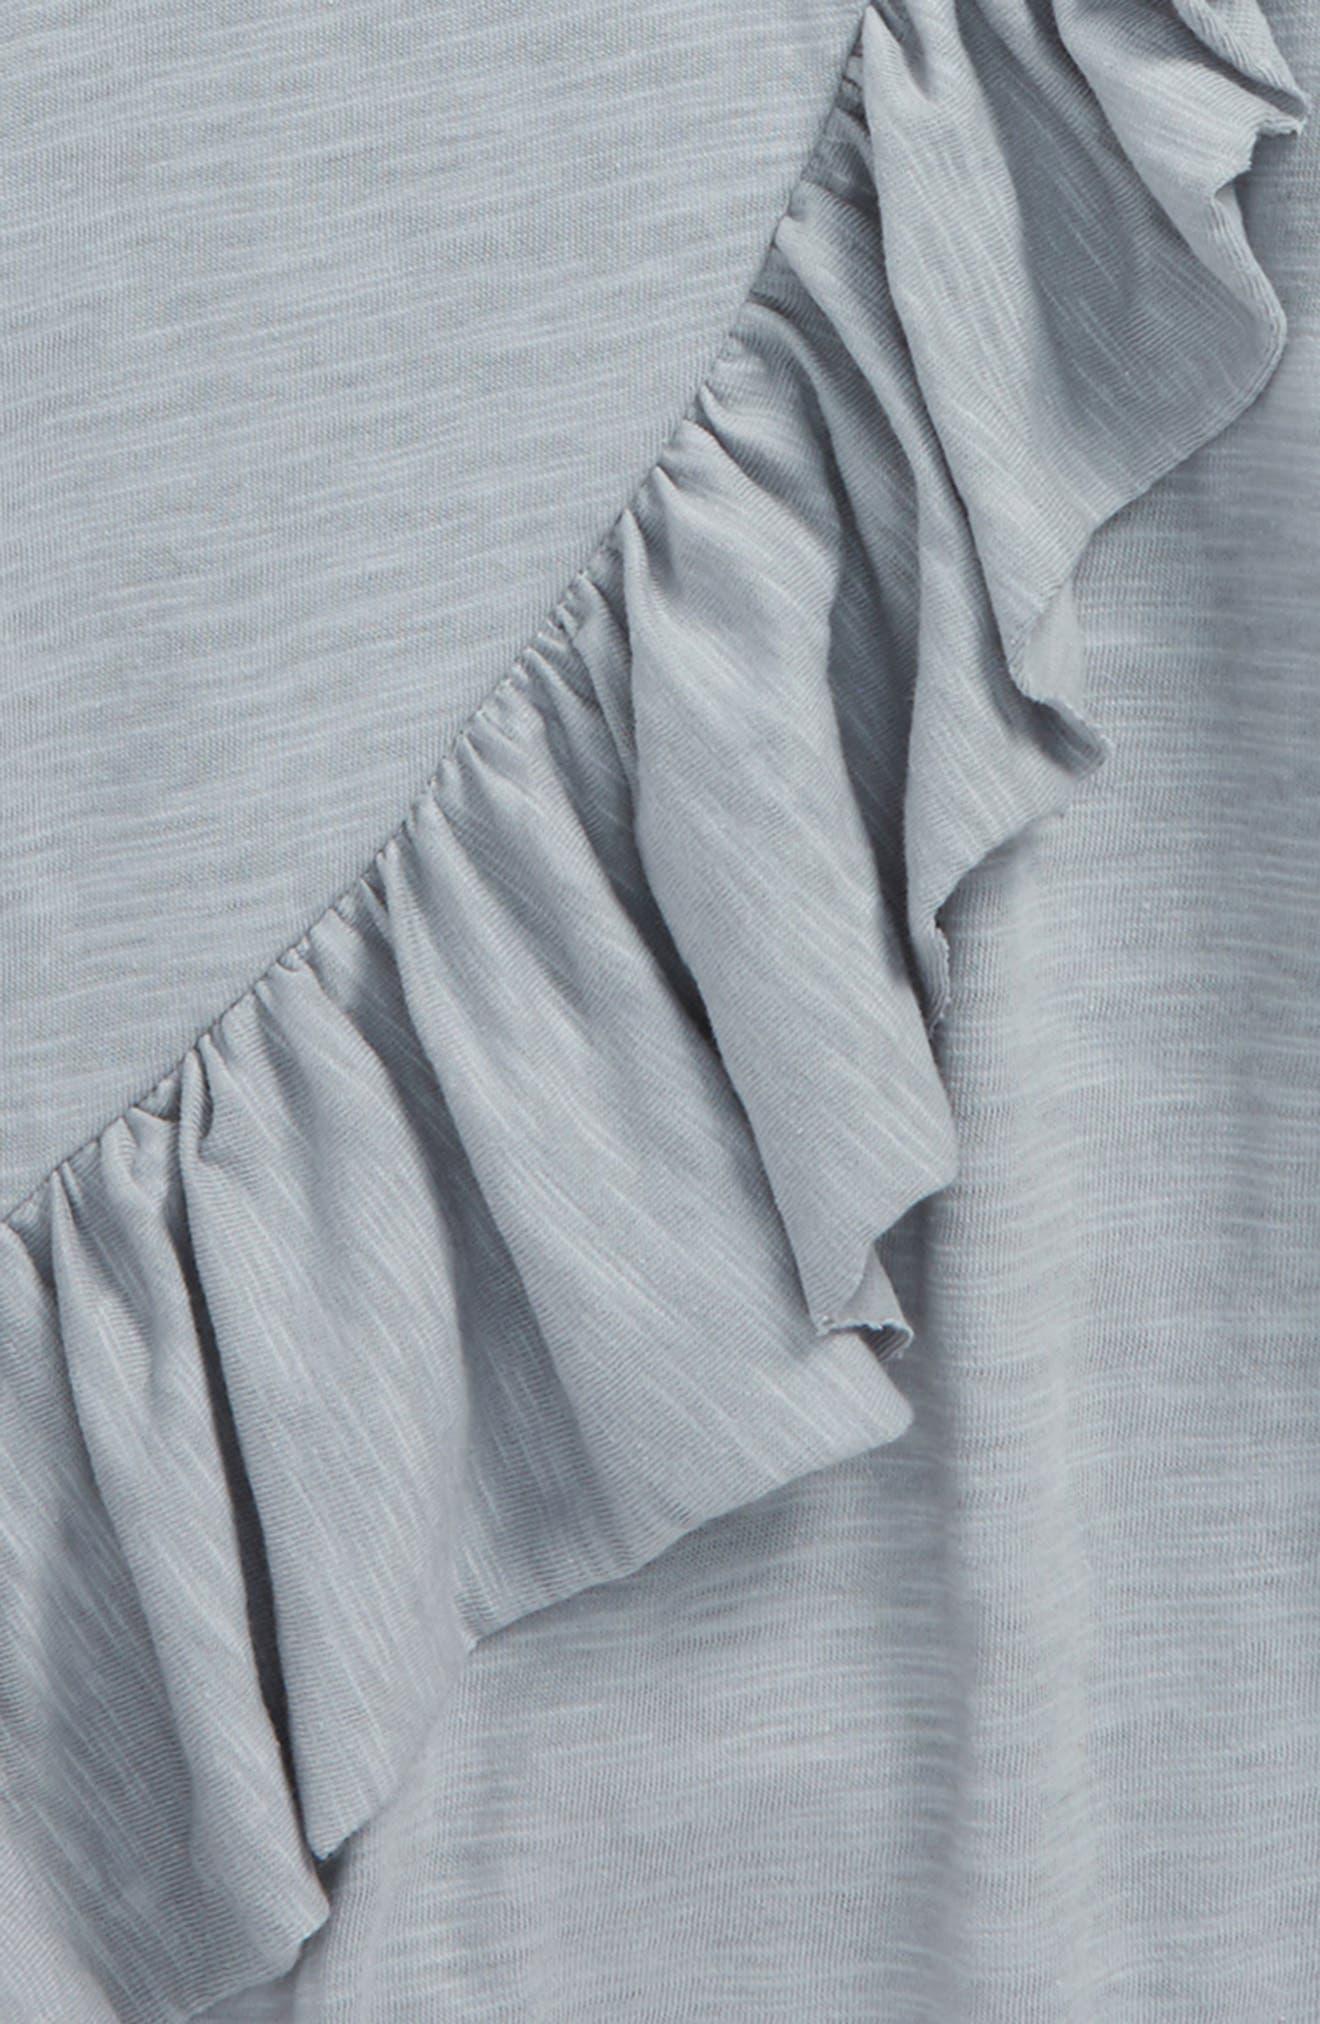 Silverlake Asymmetrical Ruffle Top,                             Alternate thumbnail 2, color,                             Light Blue